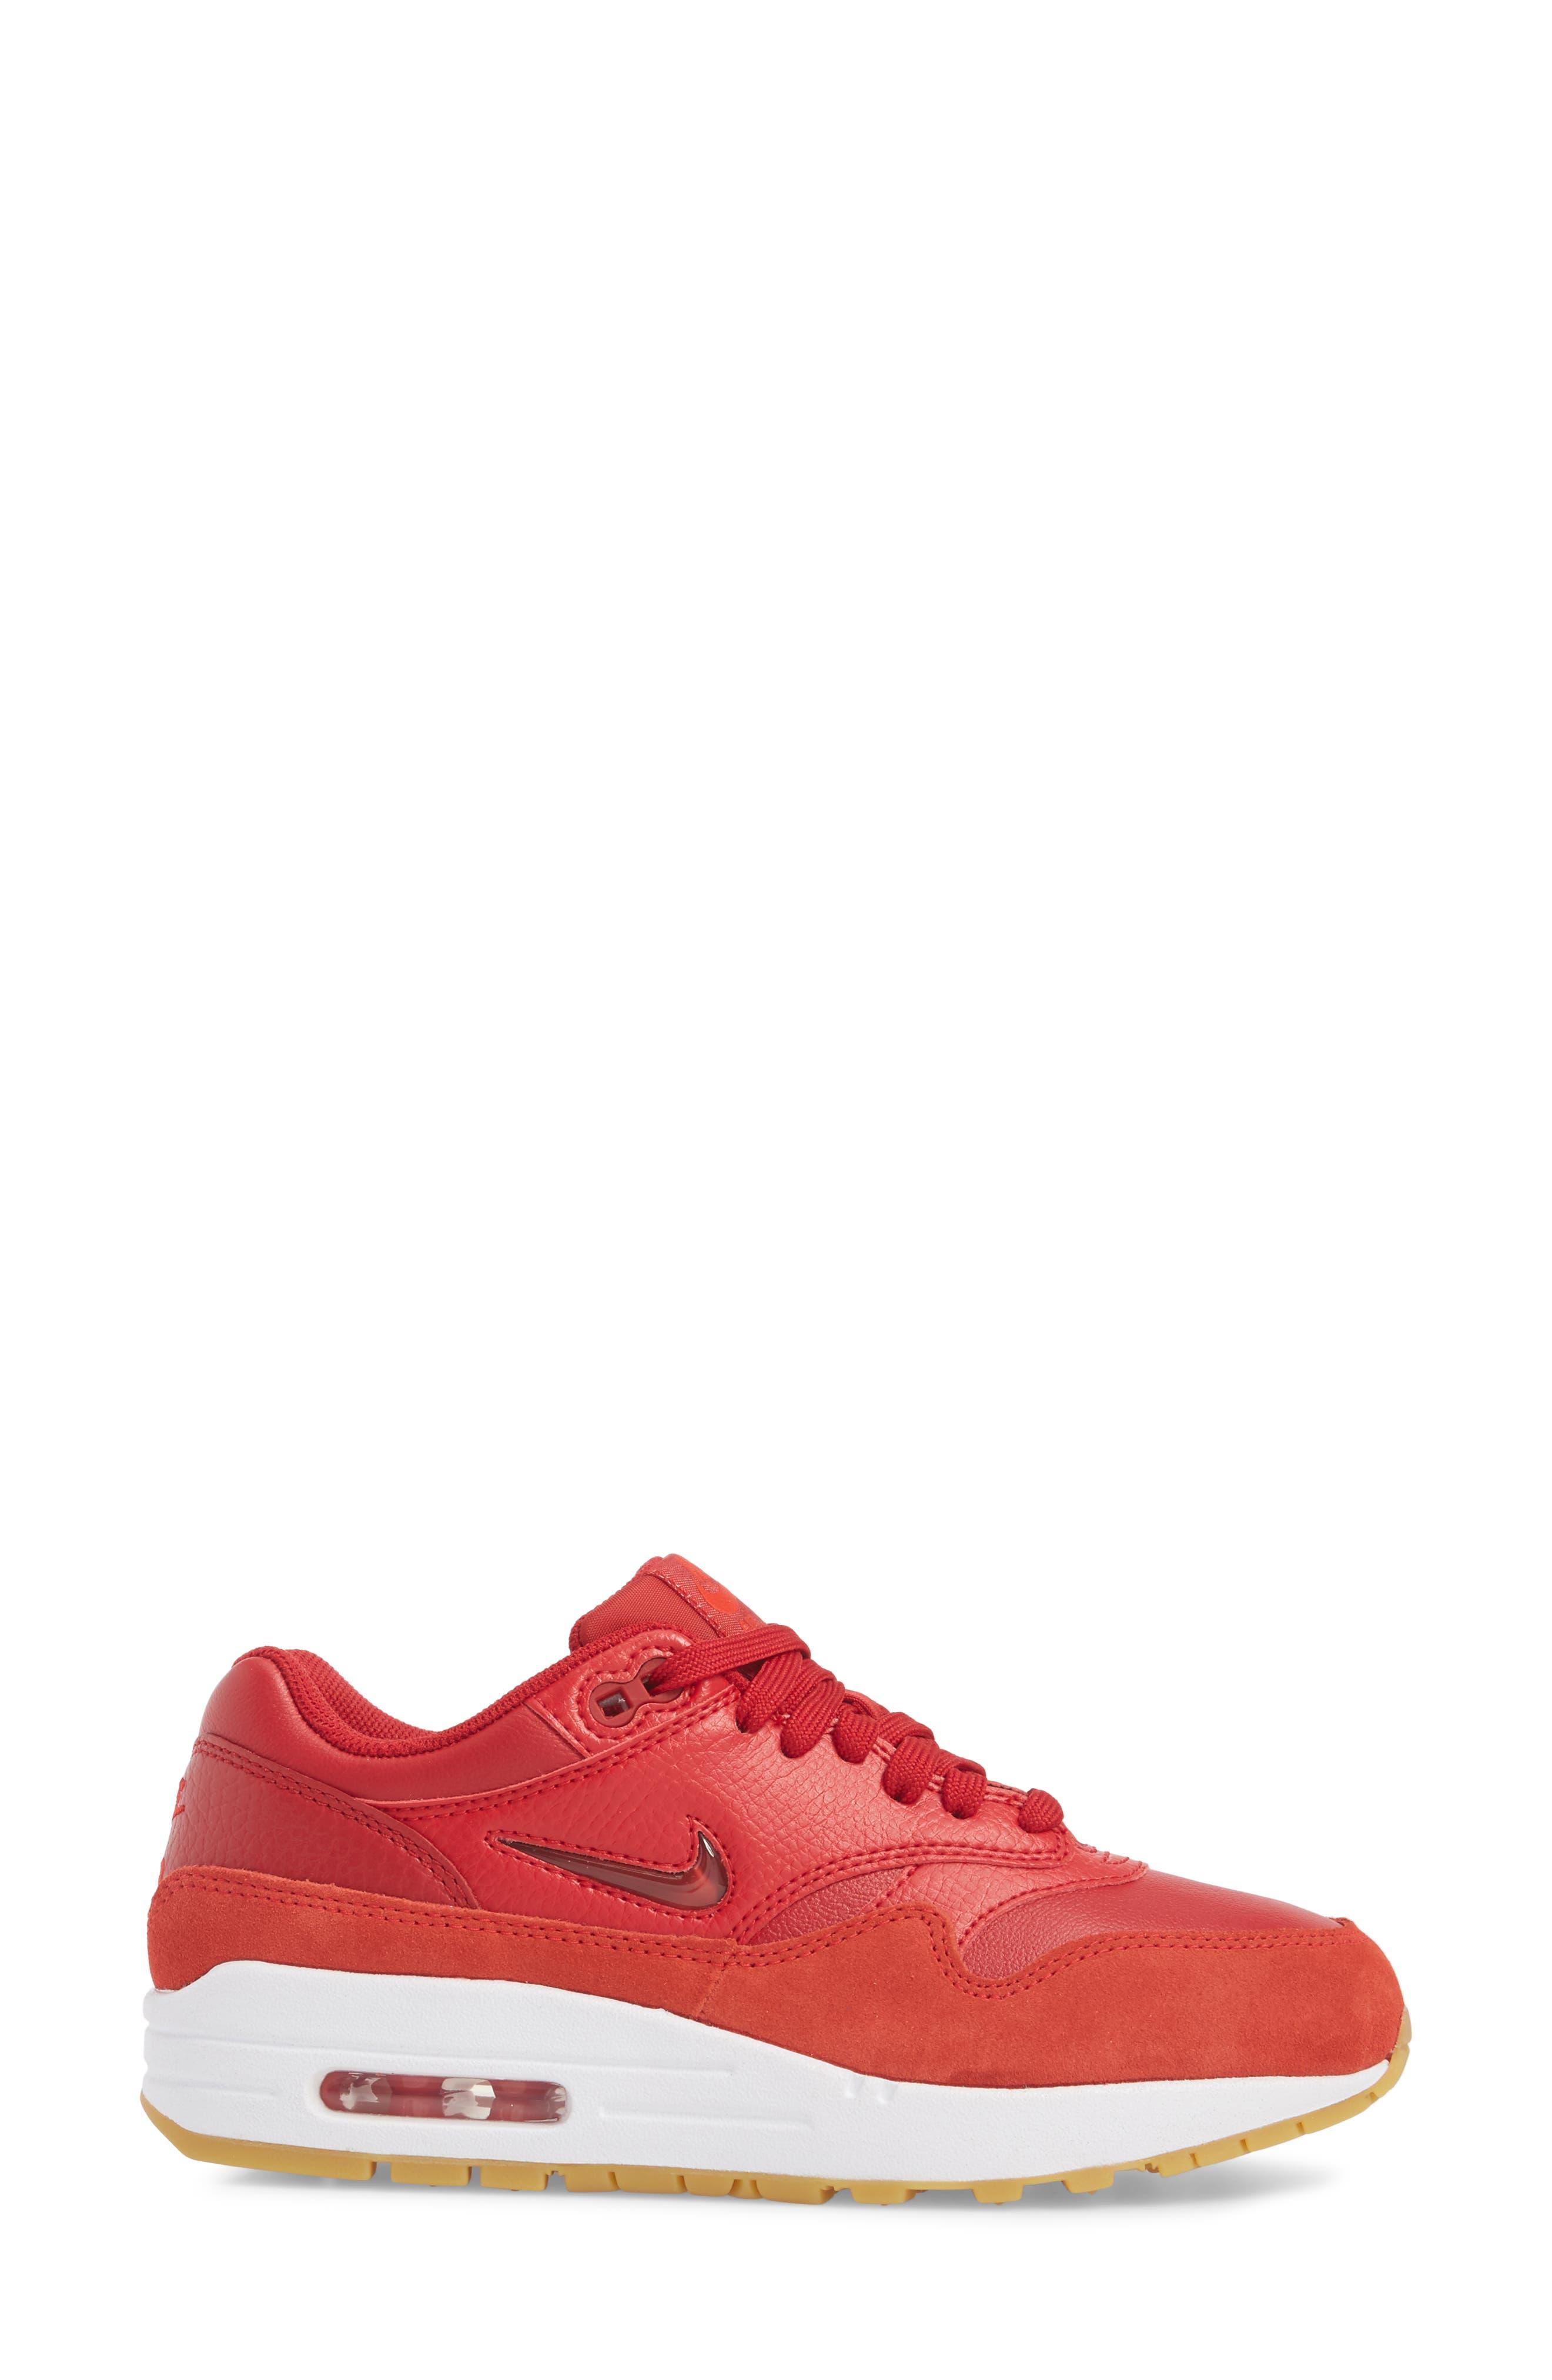 Air Max 1 Premium SC Sneaker,                             Alternate thumbnail 5, color,                             Gym Red/ Gym Red